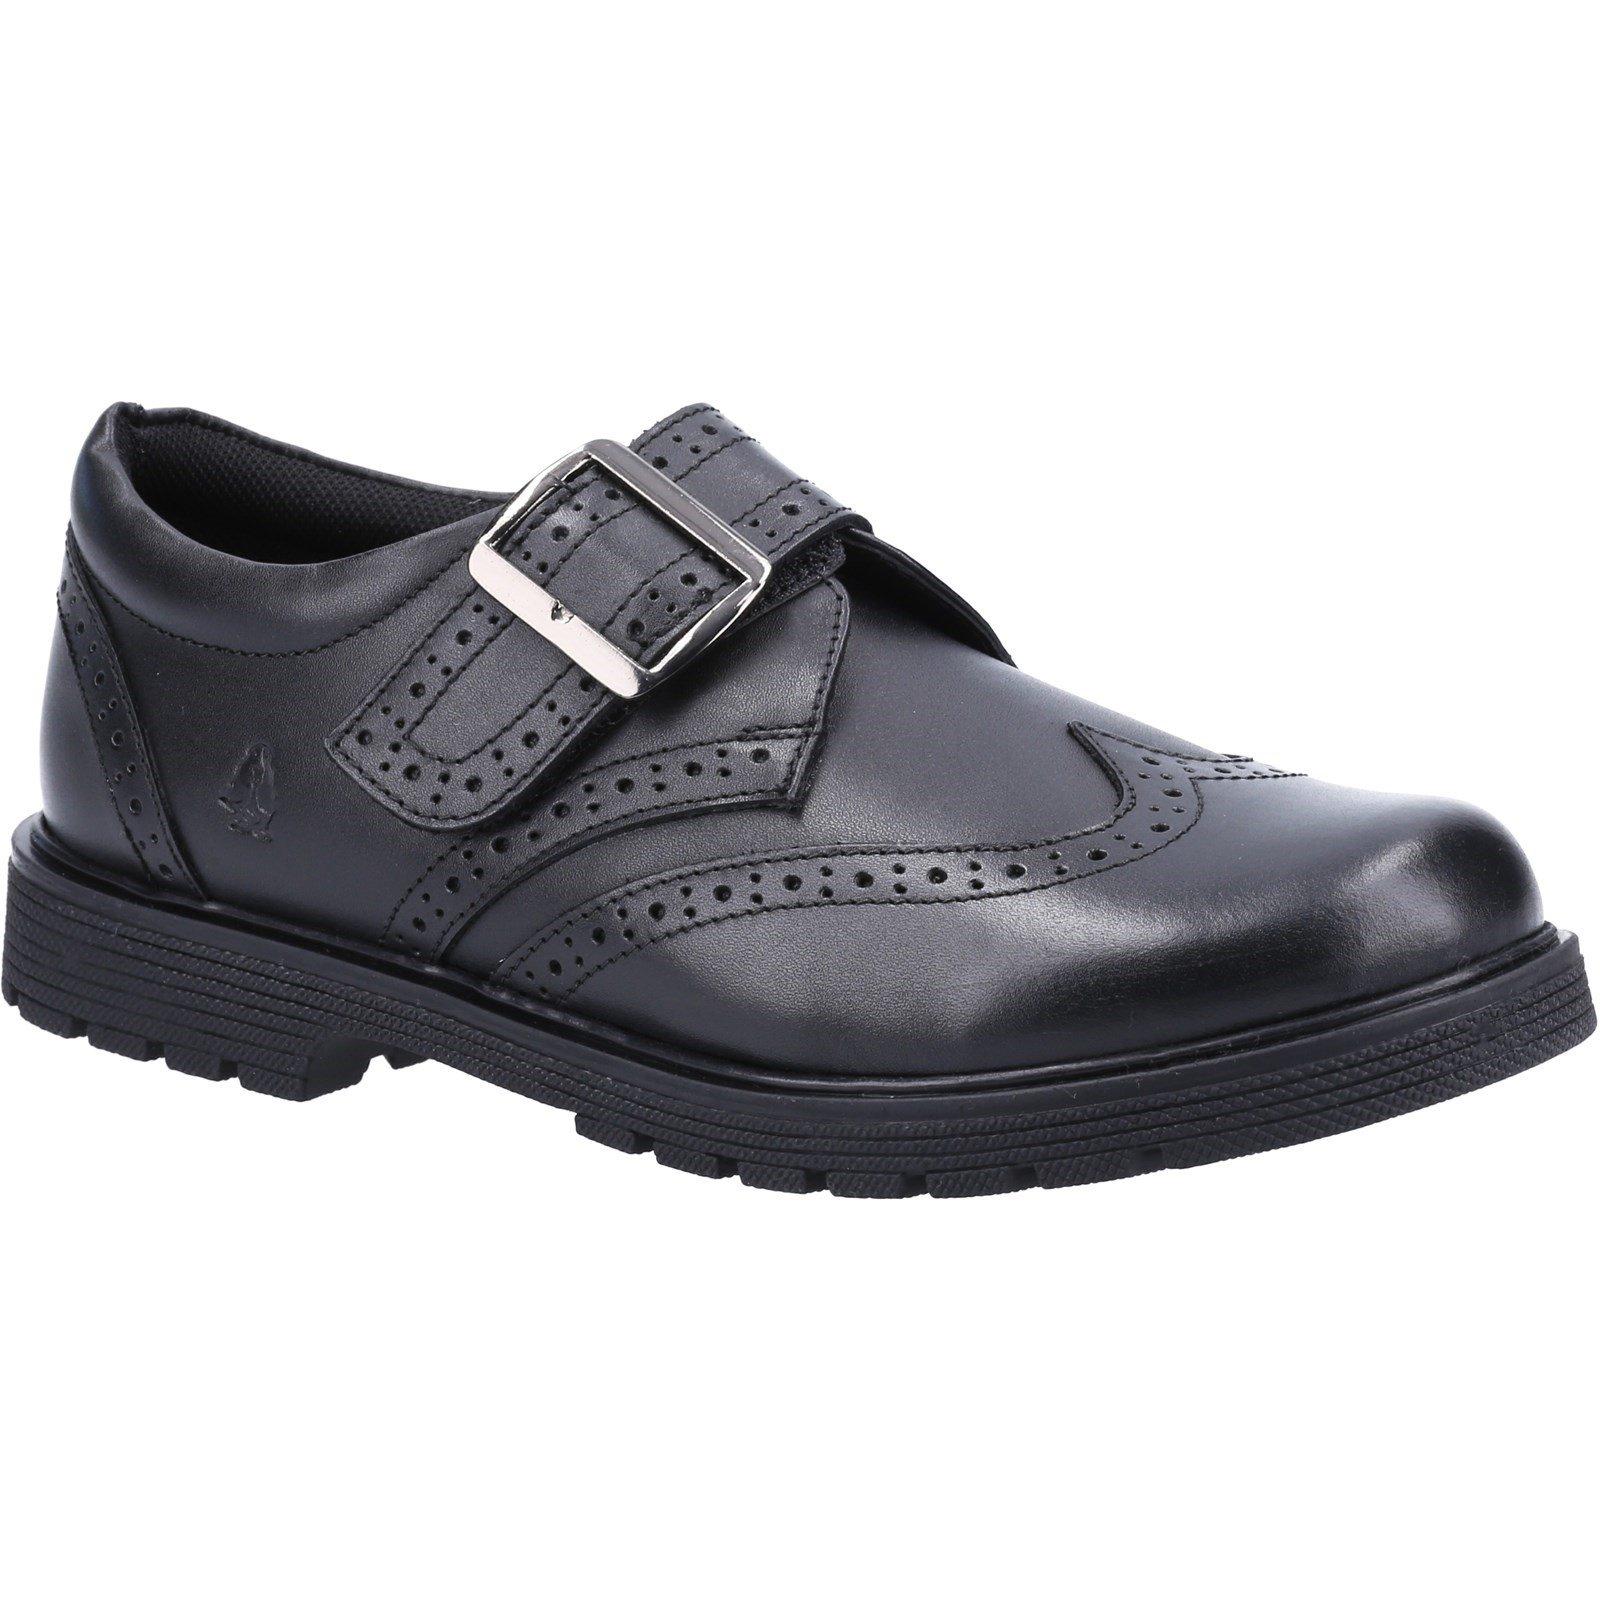 Hush Puppies Kid's Rhiannon Junior School Shoe Black 32625 - Black 2